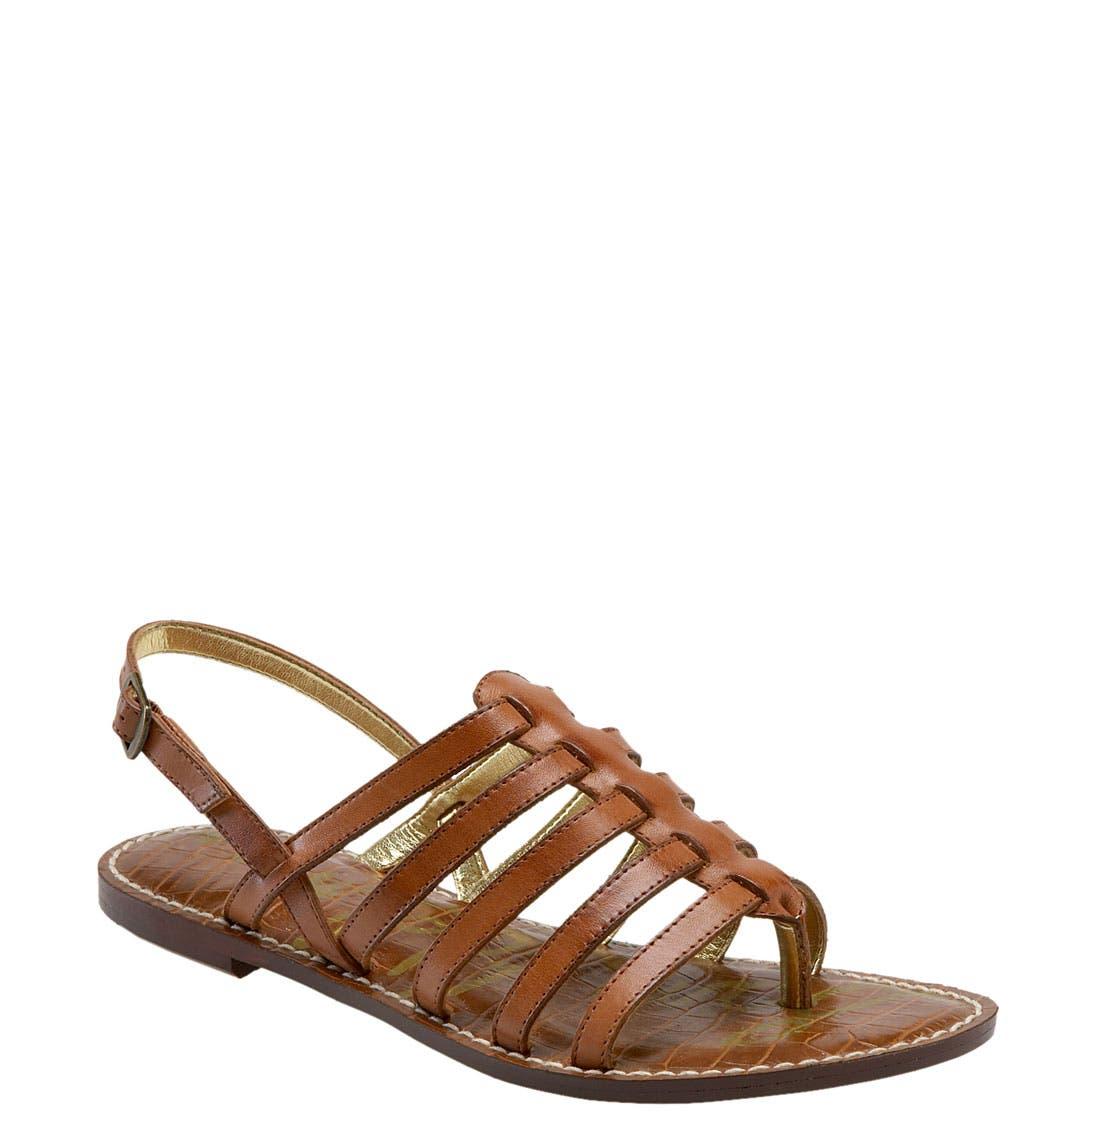 Main Image - Sam Edelman 'Hamilton' Sandal